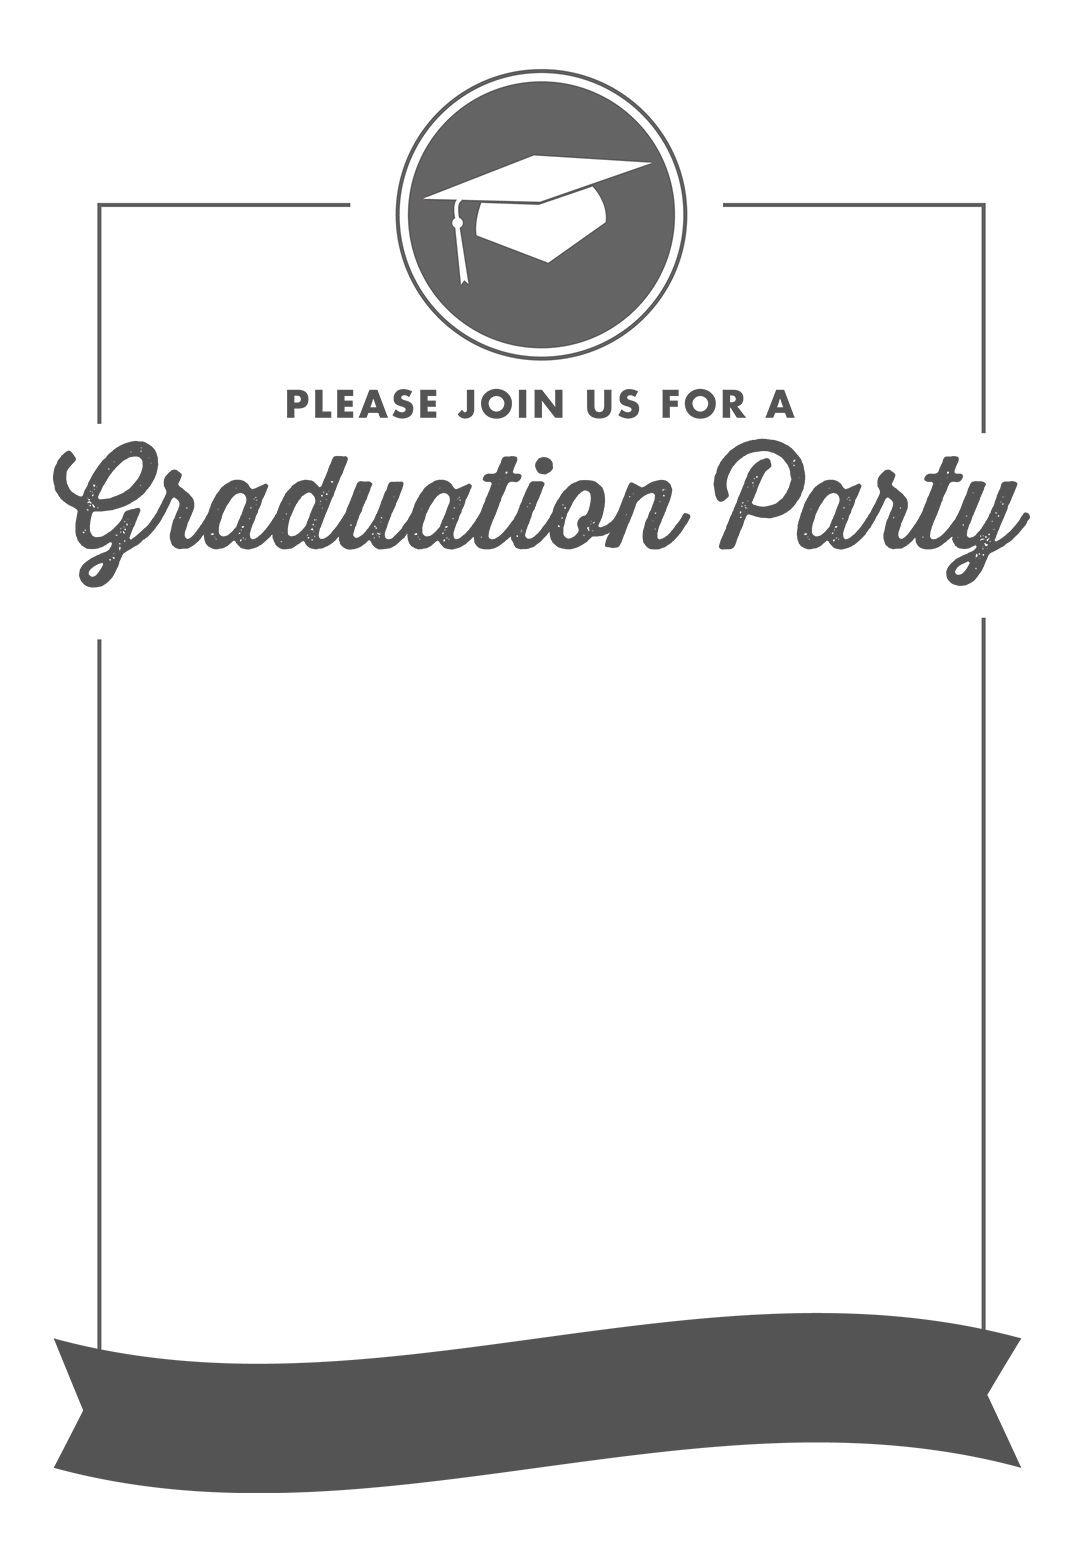 Free Printable Graduation Party Invitation Template | Greetings - Free Printable Graduation Announcements